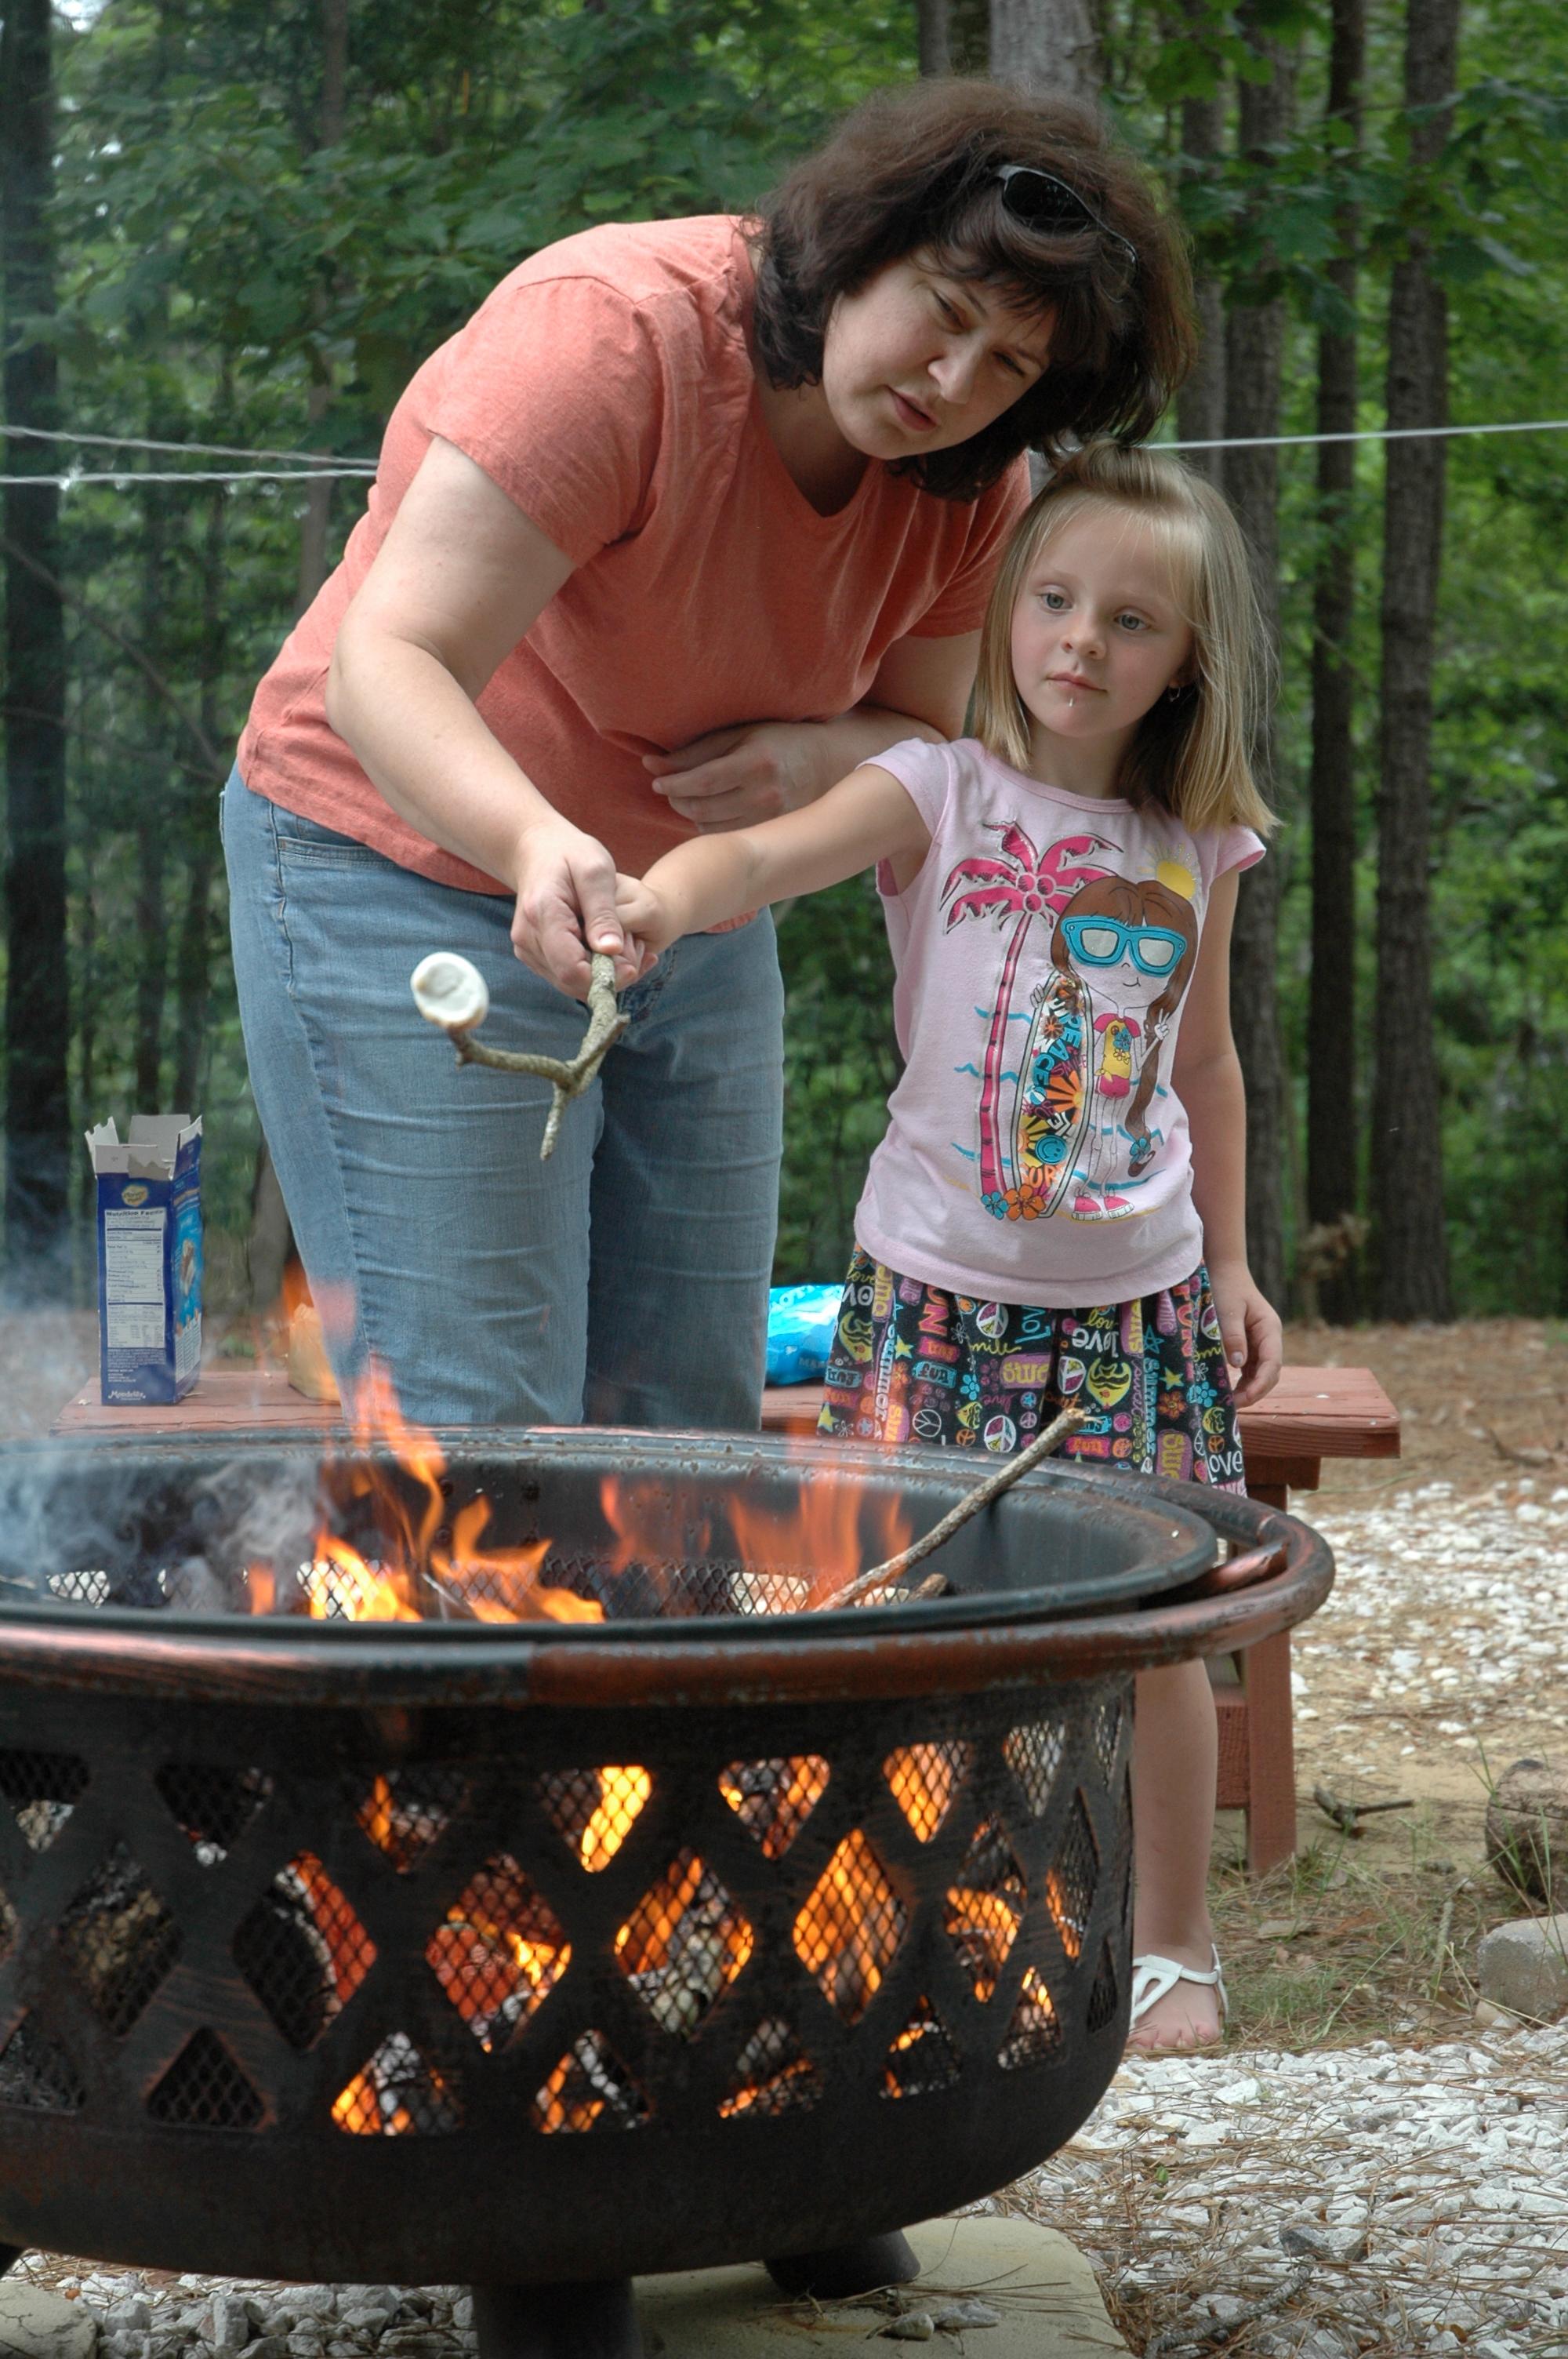 Children and Fire Pits: Safety Essentials